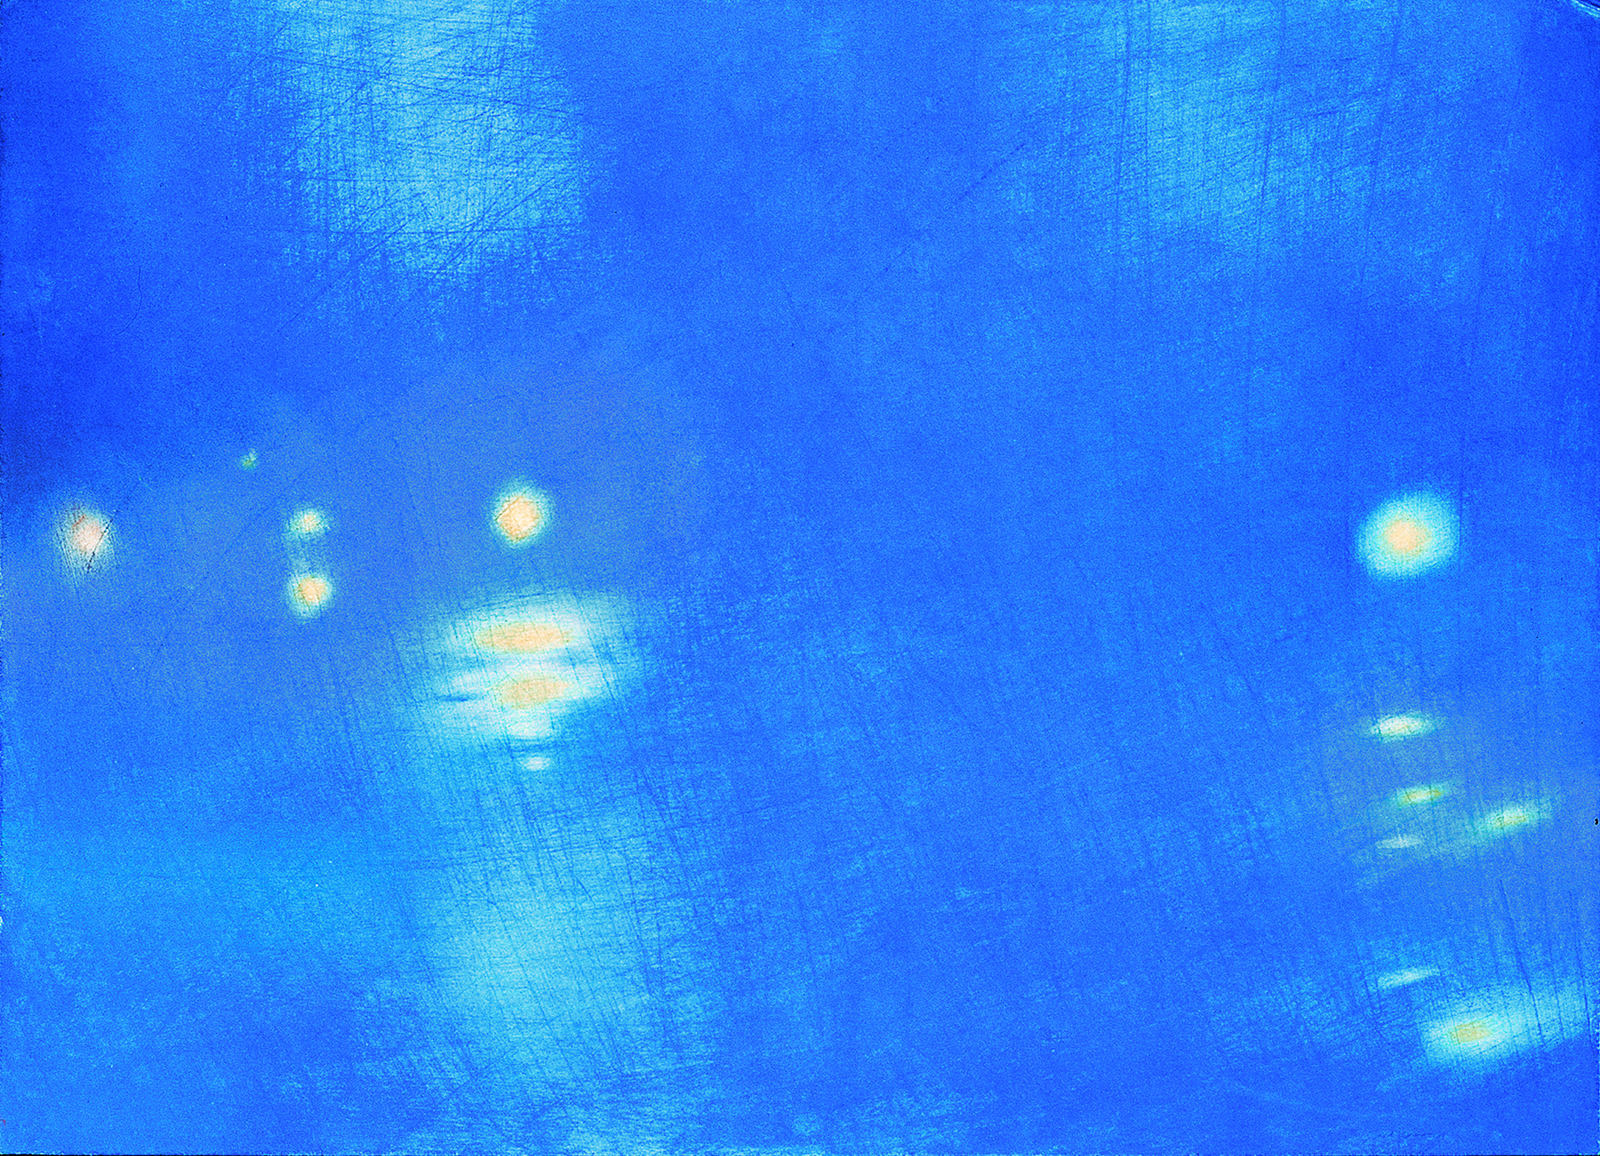 Memoria d'acqua, 2000, pastello su cartoncino, 36'5 x 51 cm.